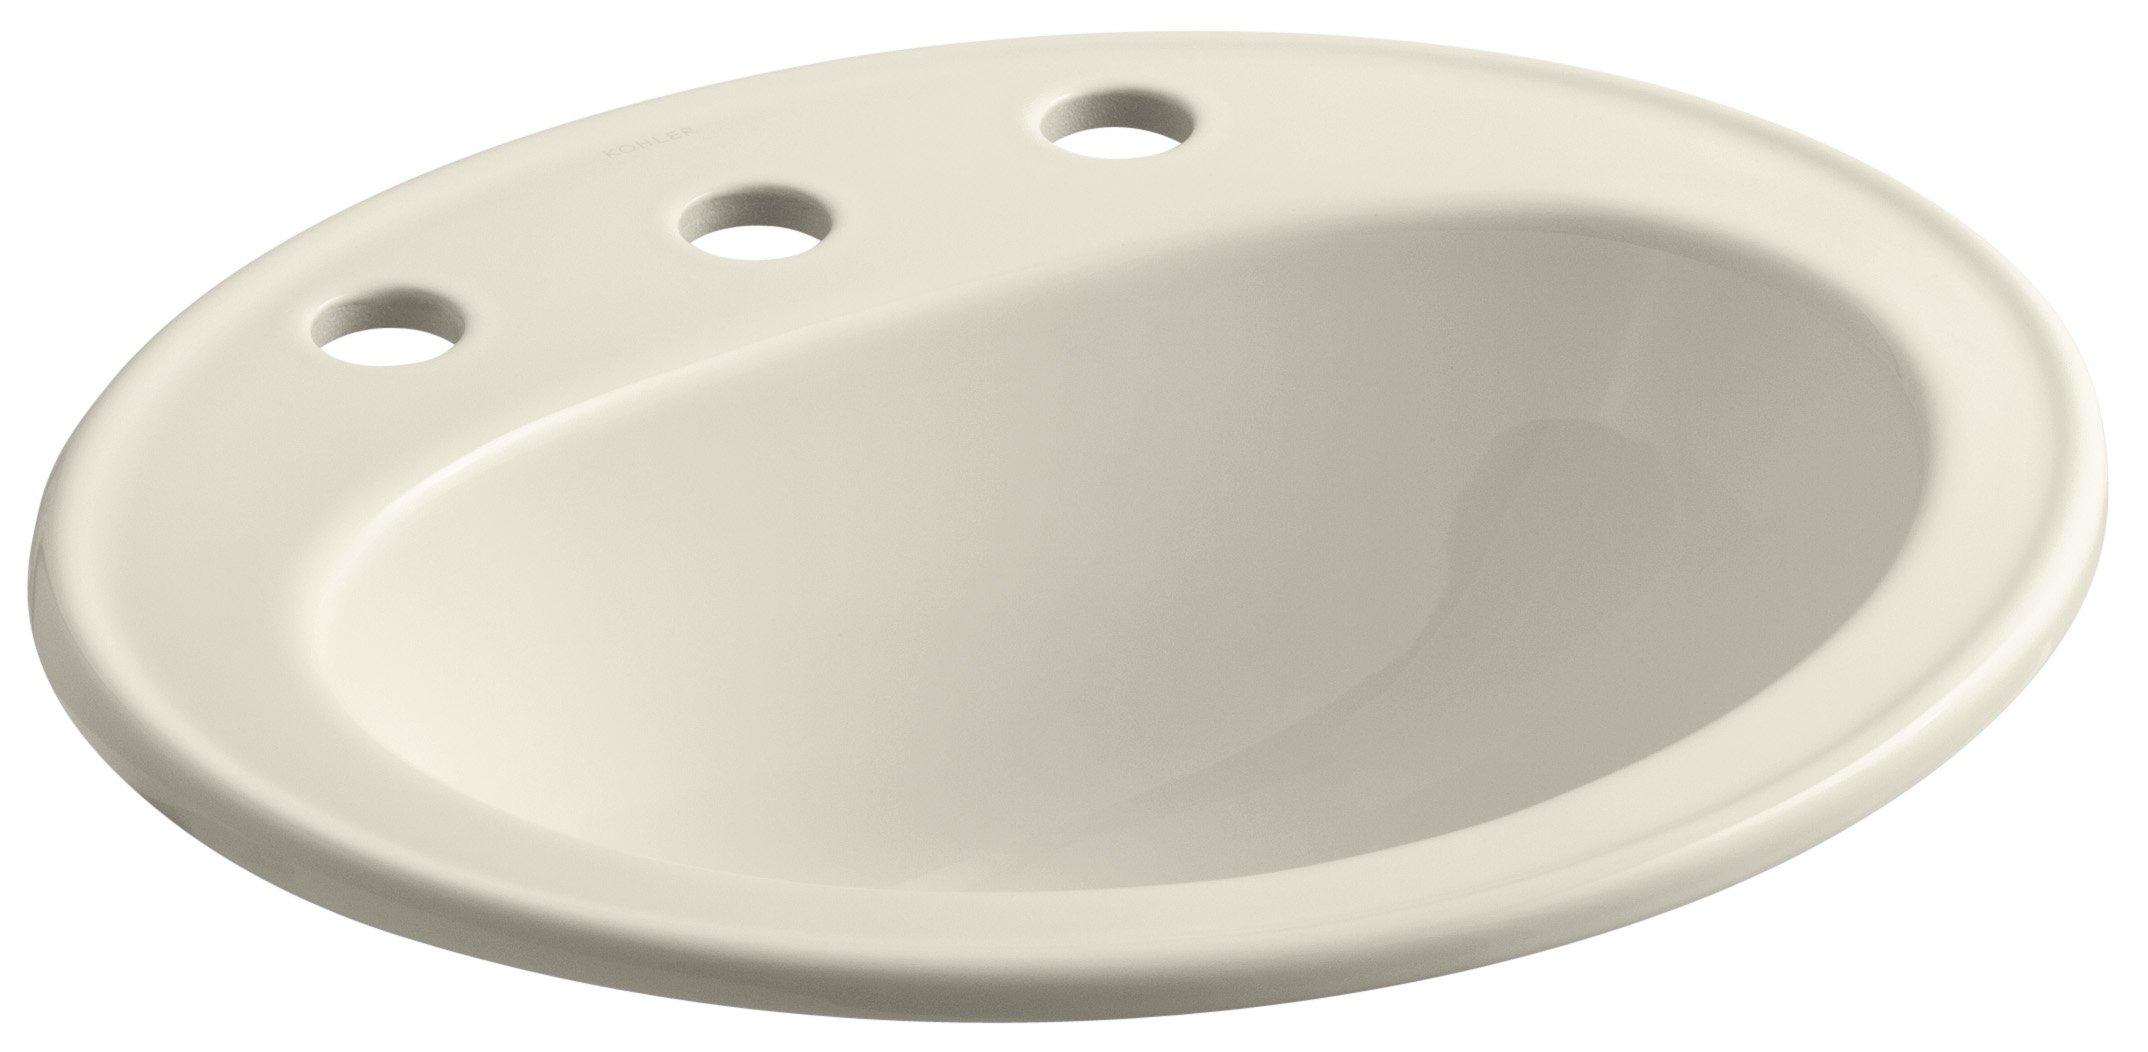 KOHLER K-2196-8-47 Pennington Self-Rimming Bathroom Sink, Almond